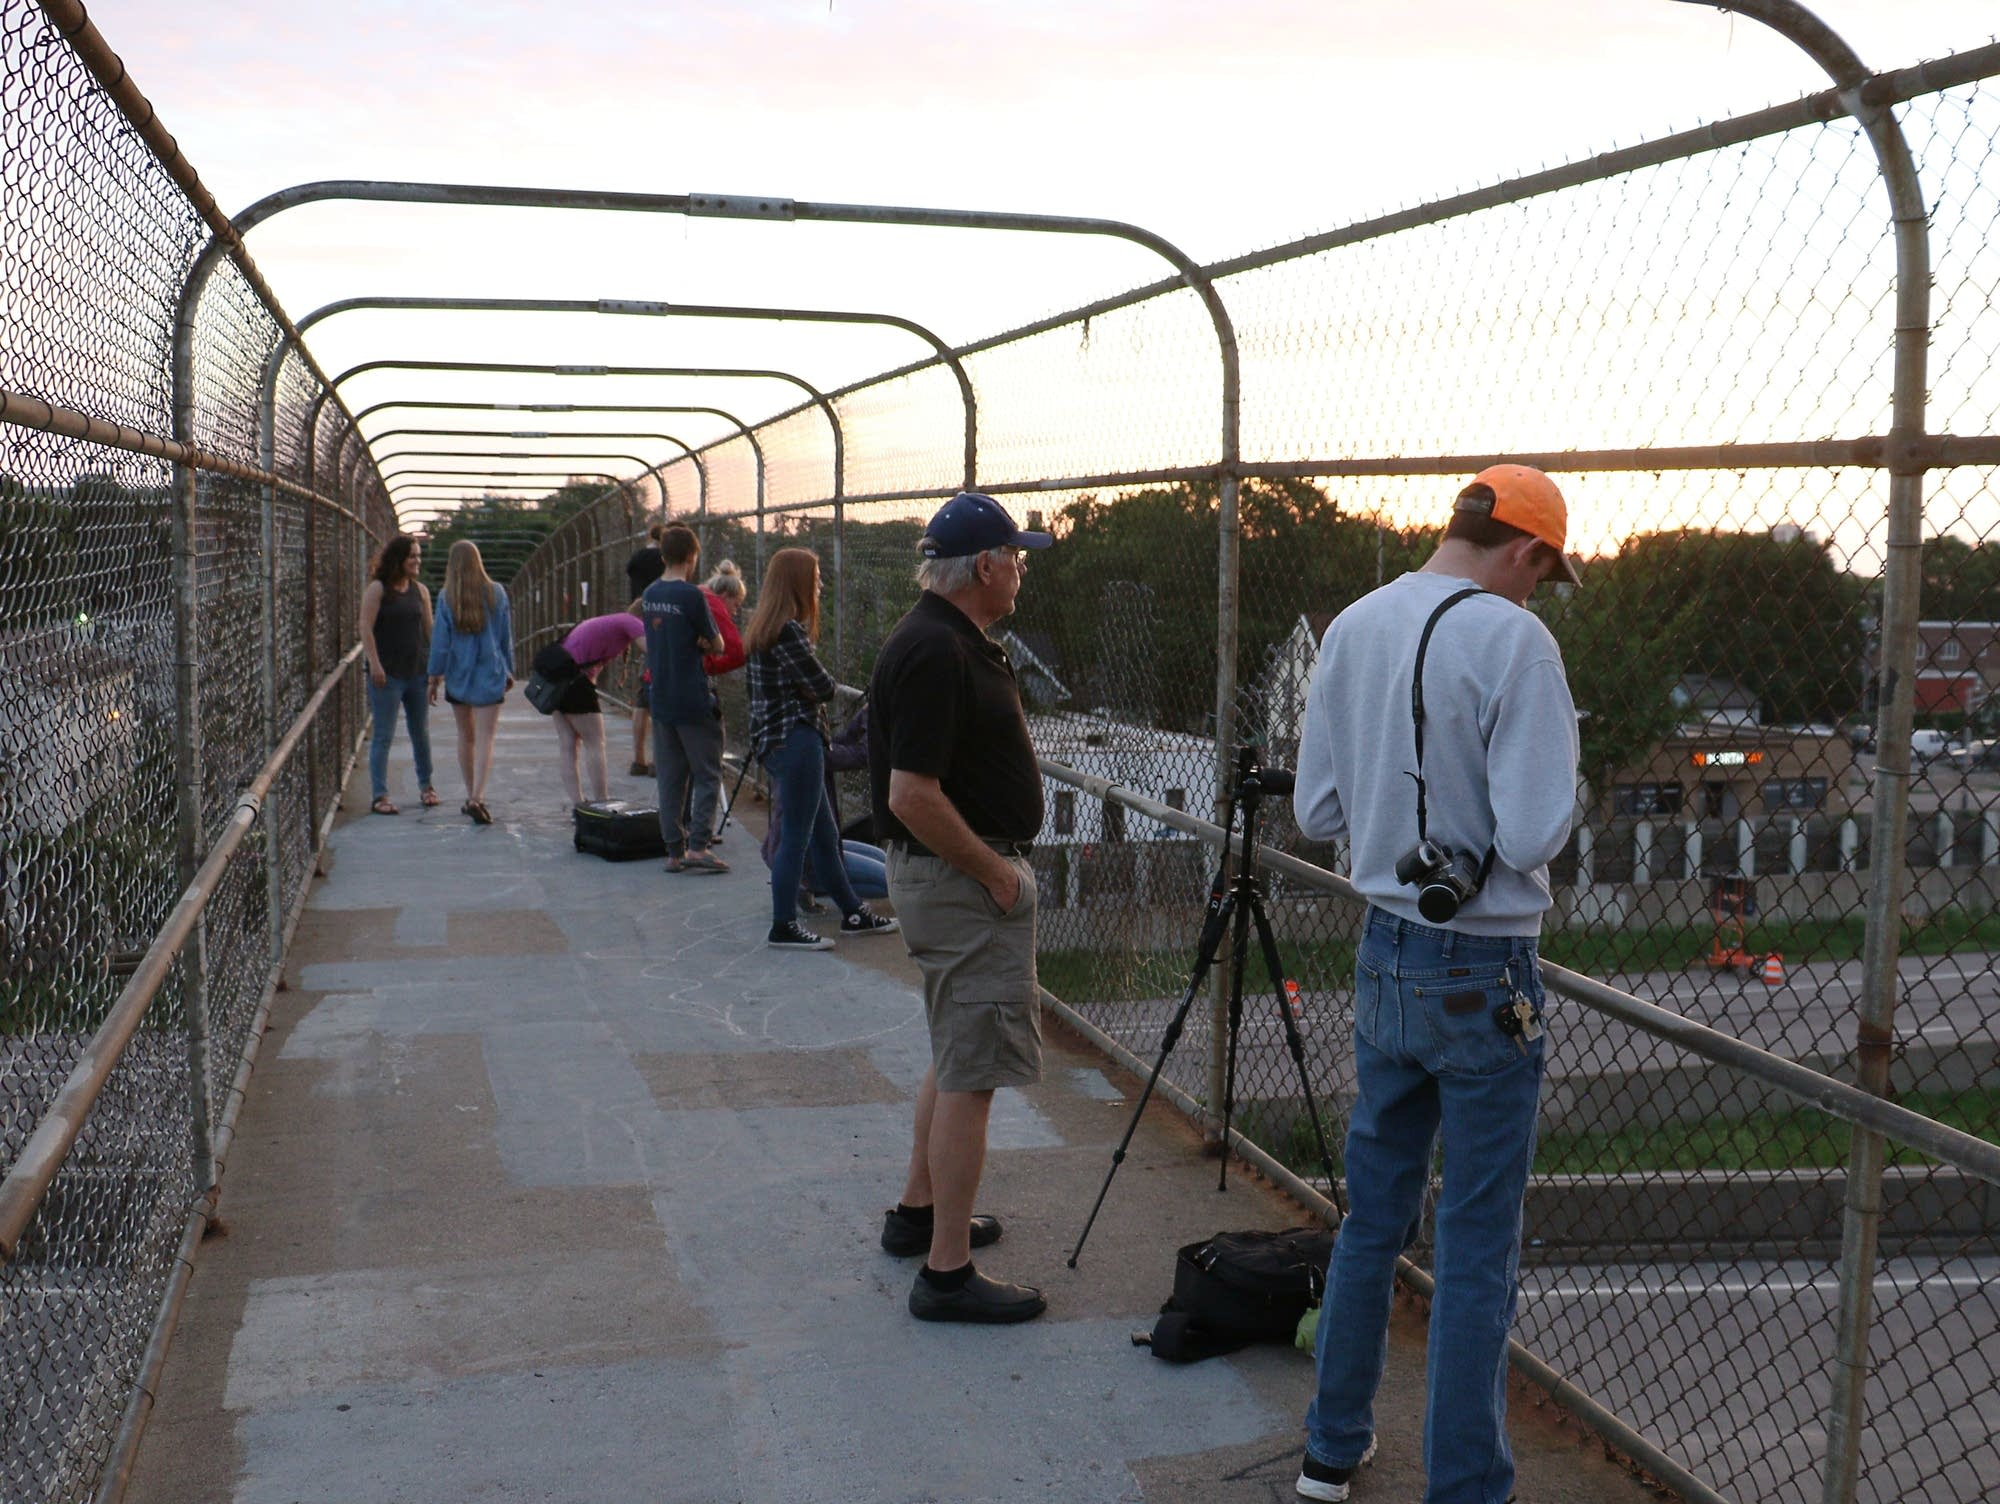 Vanishing view: In last days of Minneapolis bridge, photographers ...